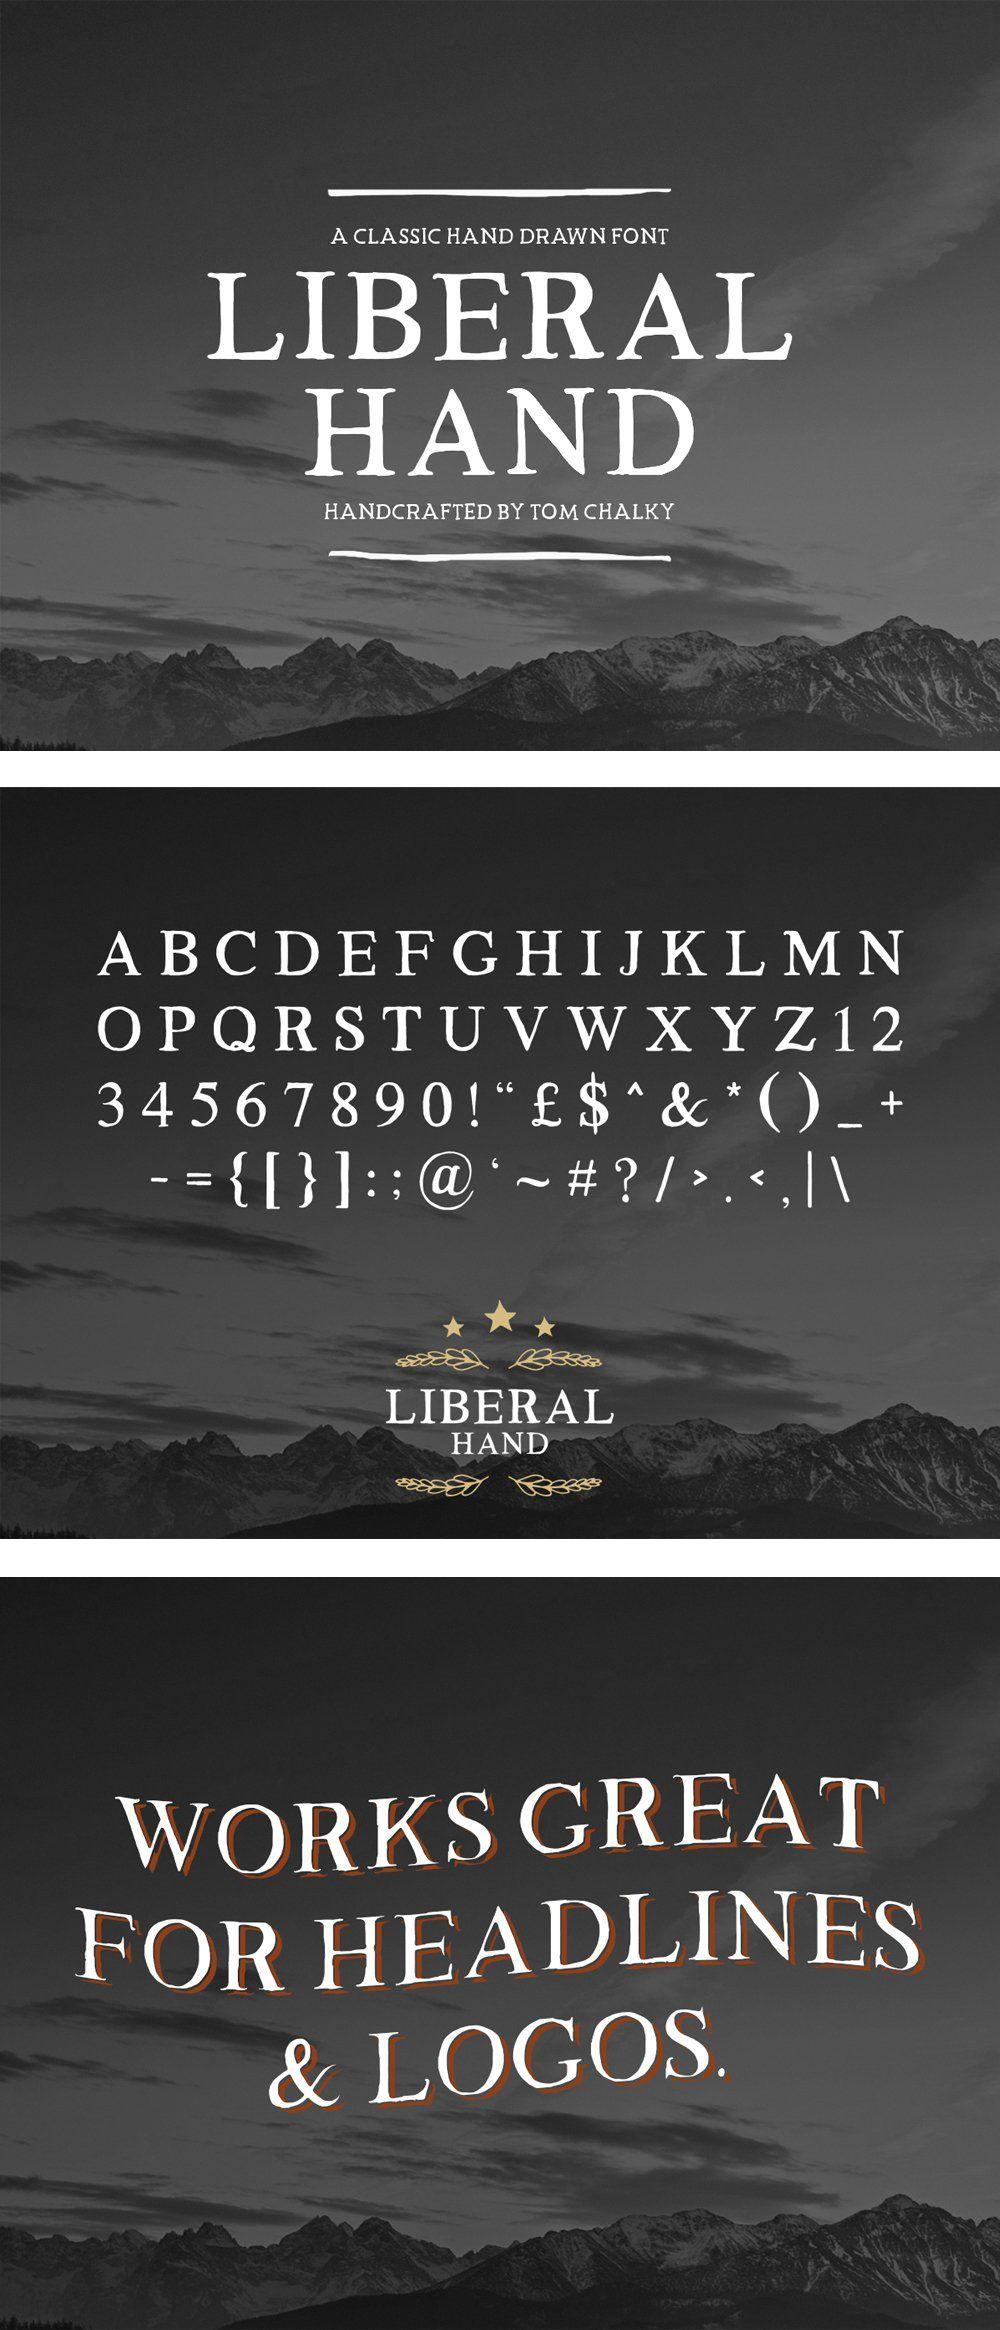 Best Free Hand Drawn Fonts Best free fonts, Free font